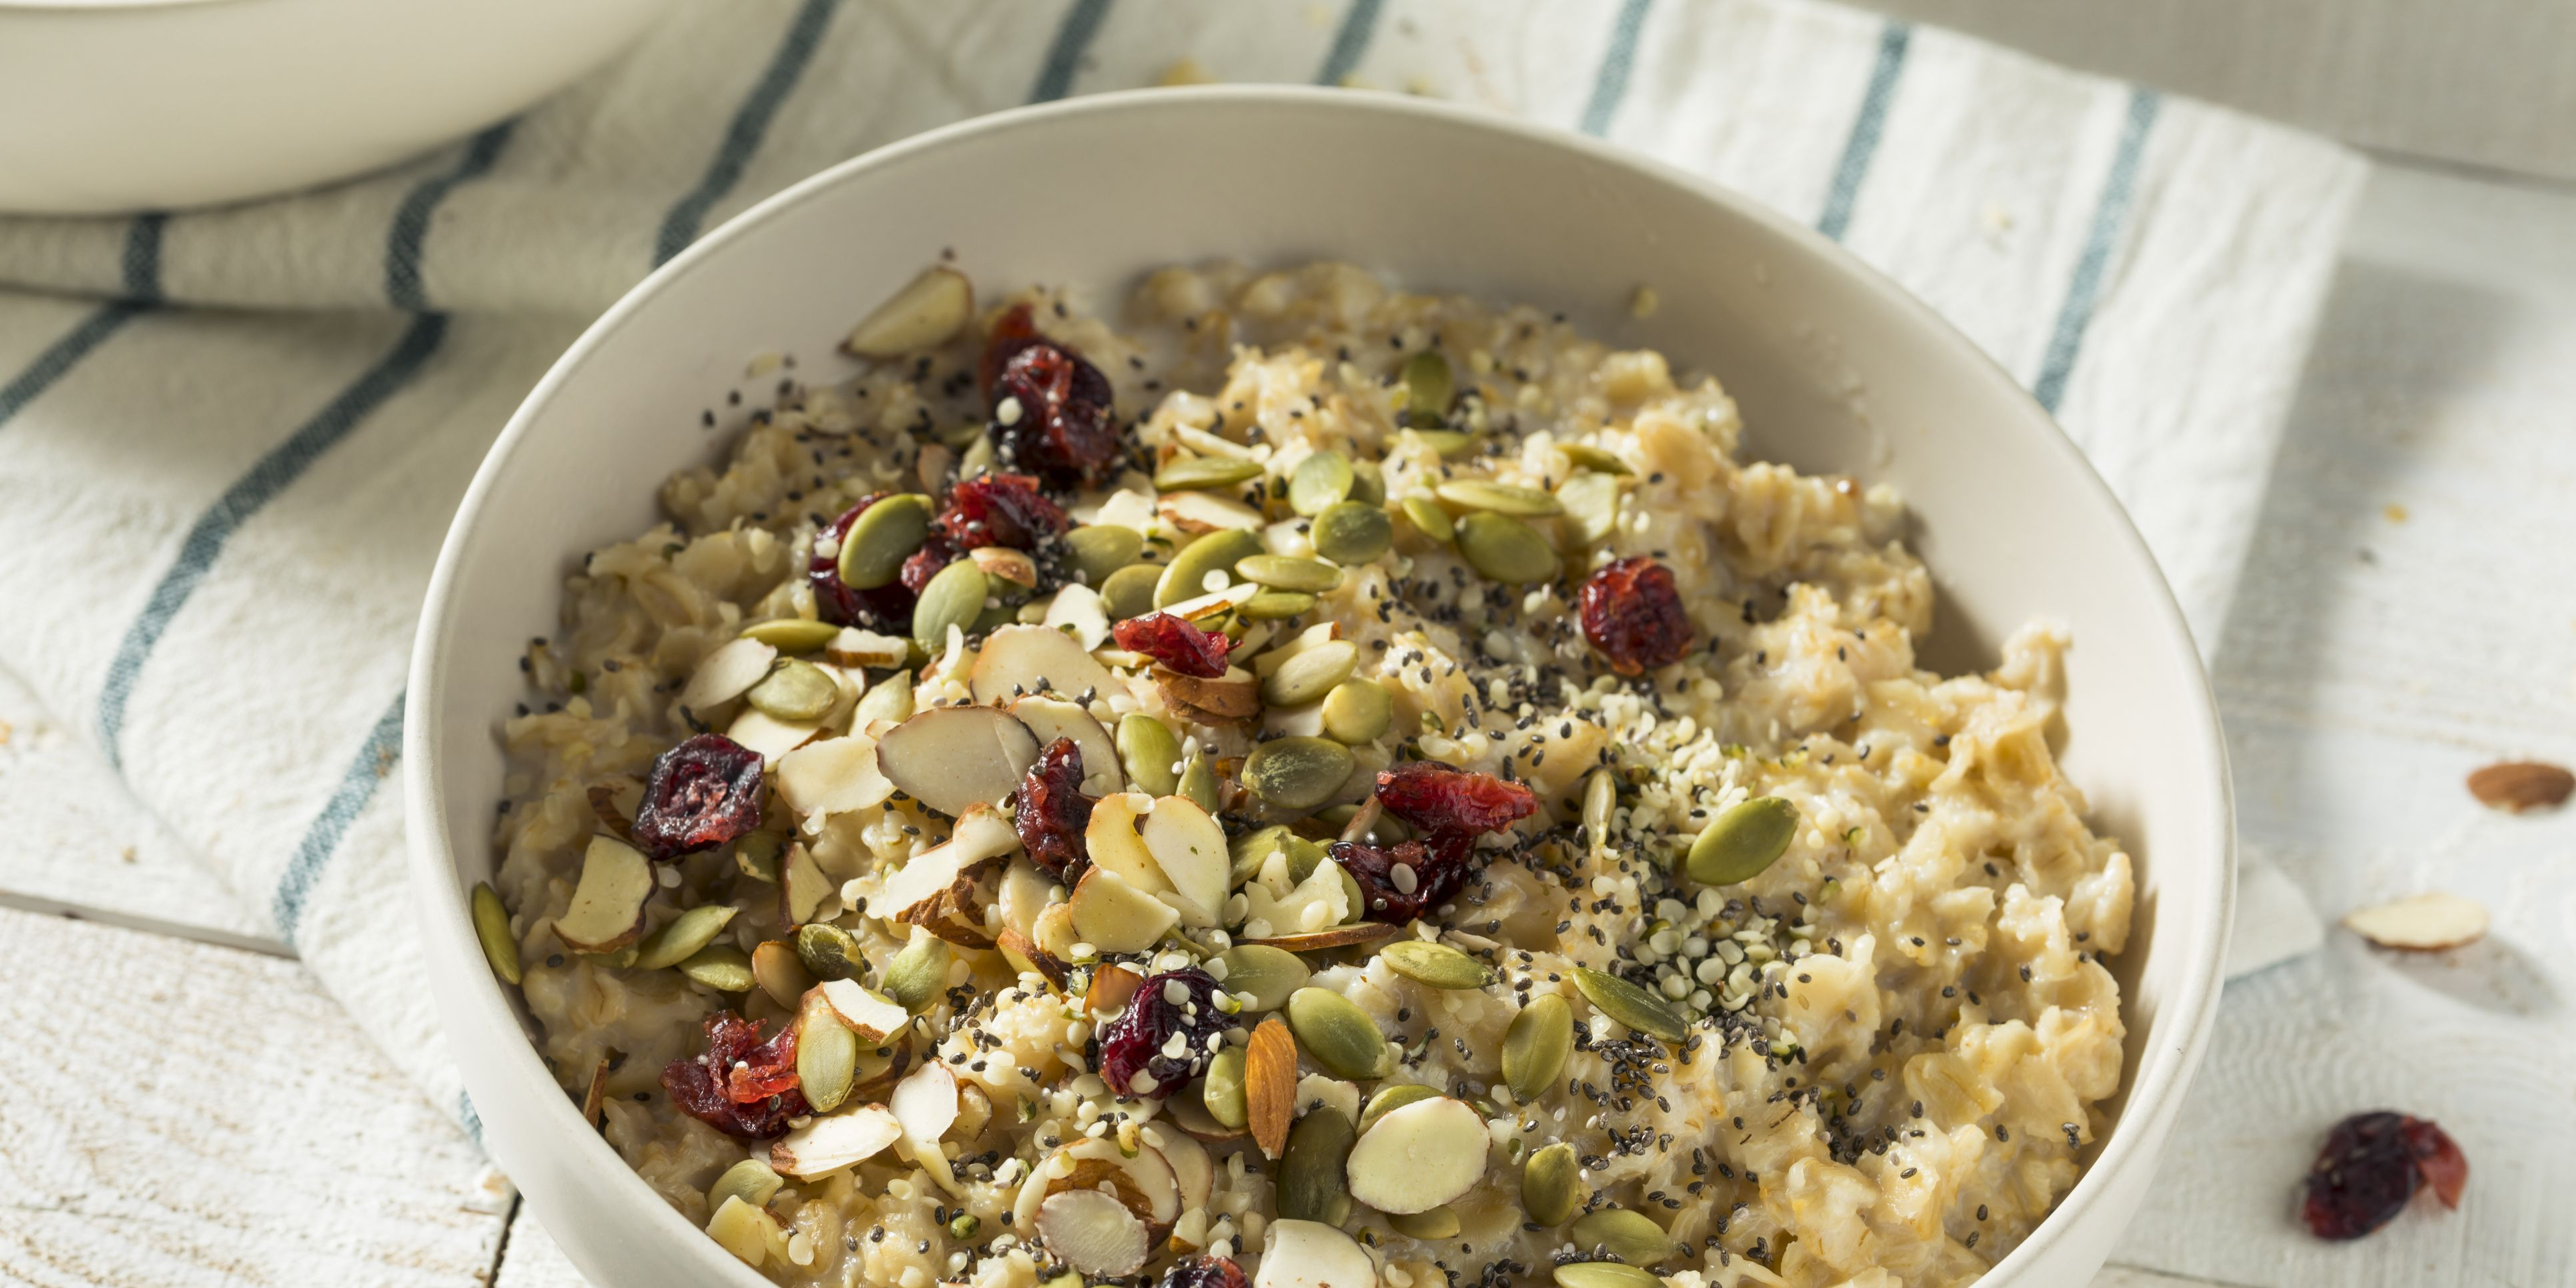 Healthy Organic Superfood Oatmeal Breakfast